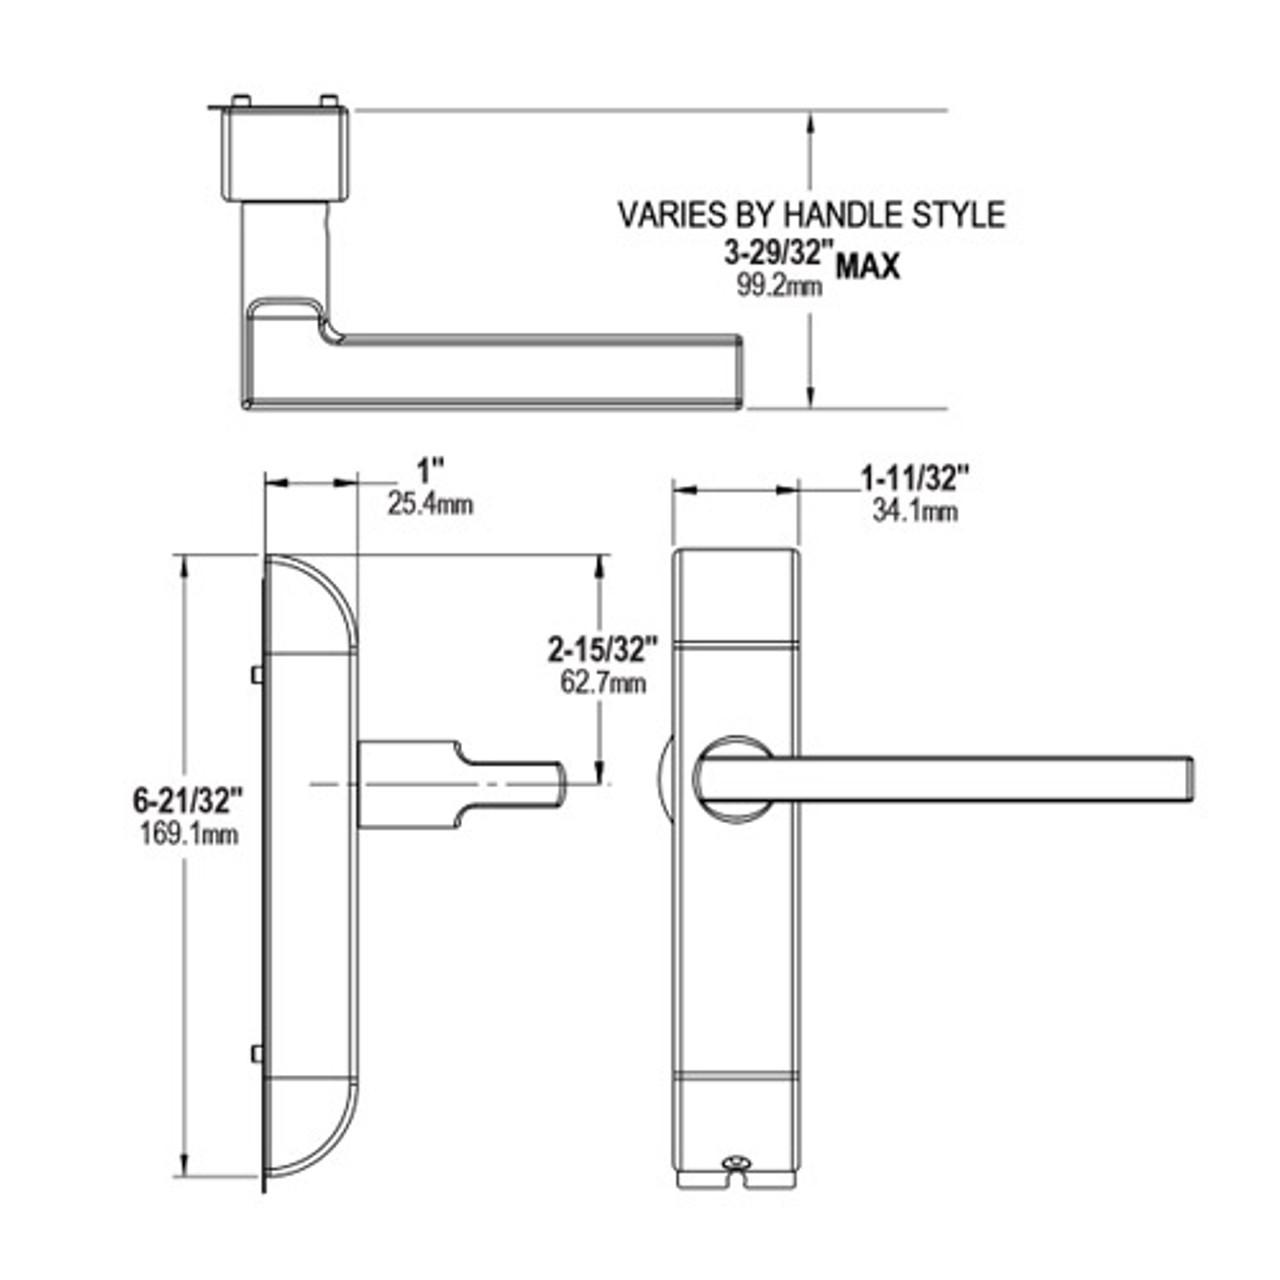 4600M-MD-642-US3 Adams Rite MD Designer handle Dimensional View